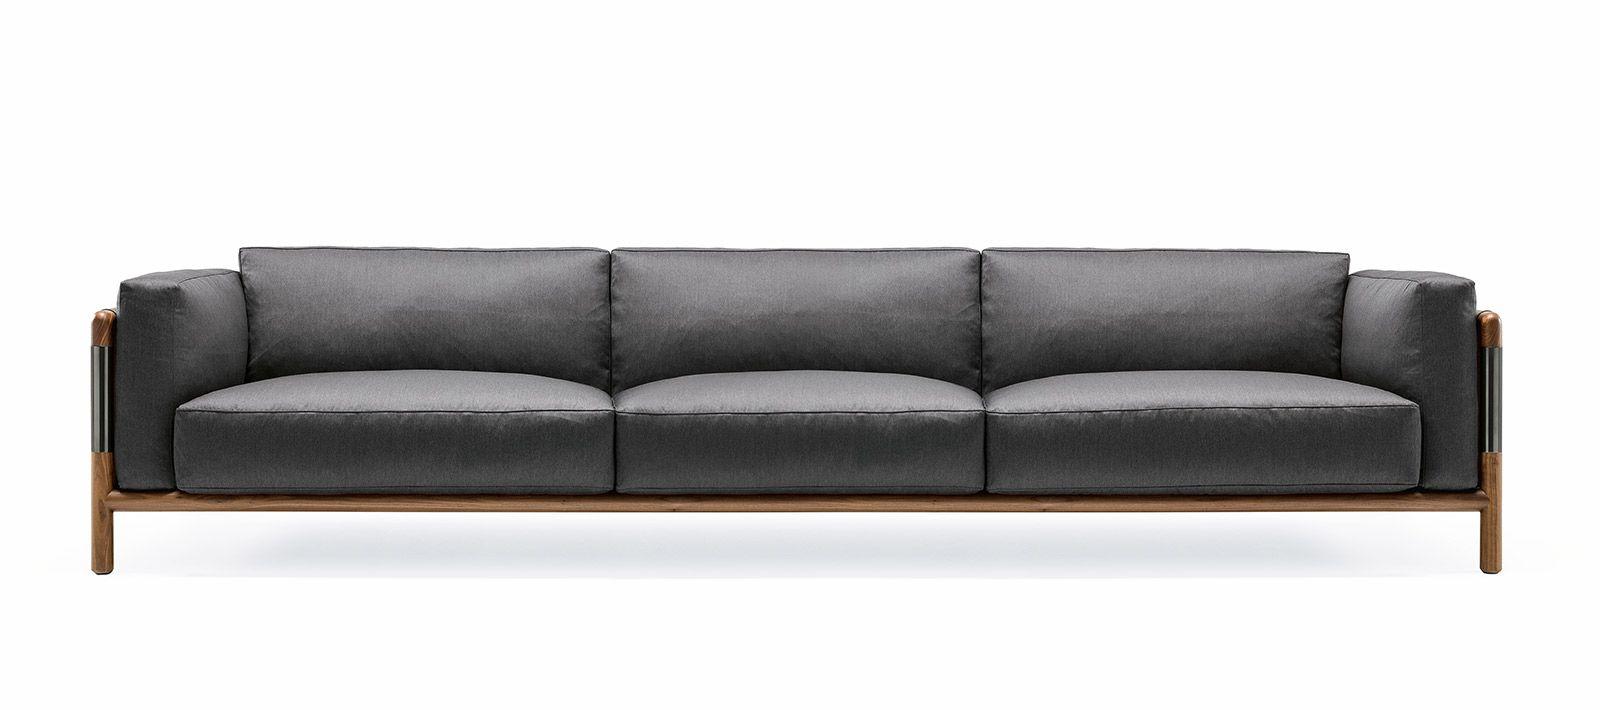 carlo colombo urban sofa interior supply